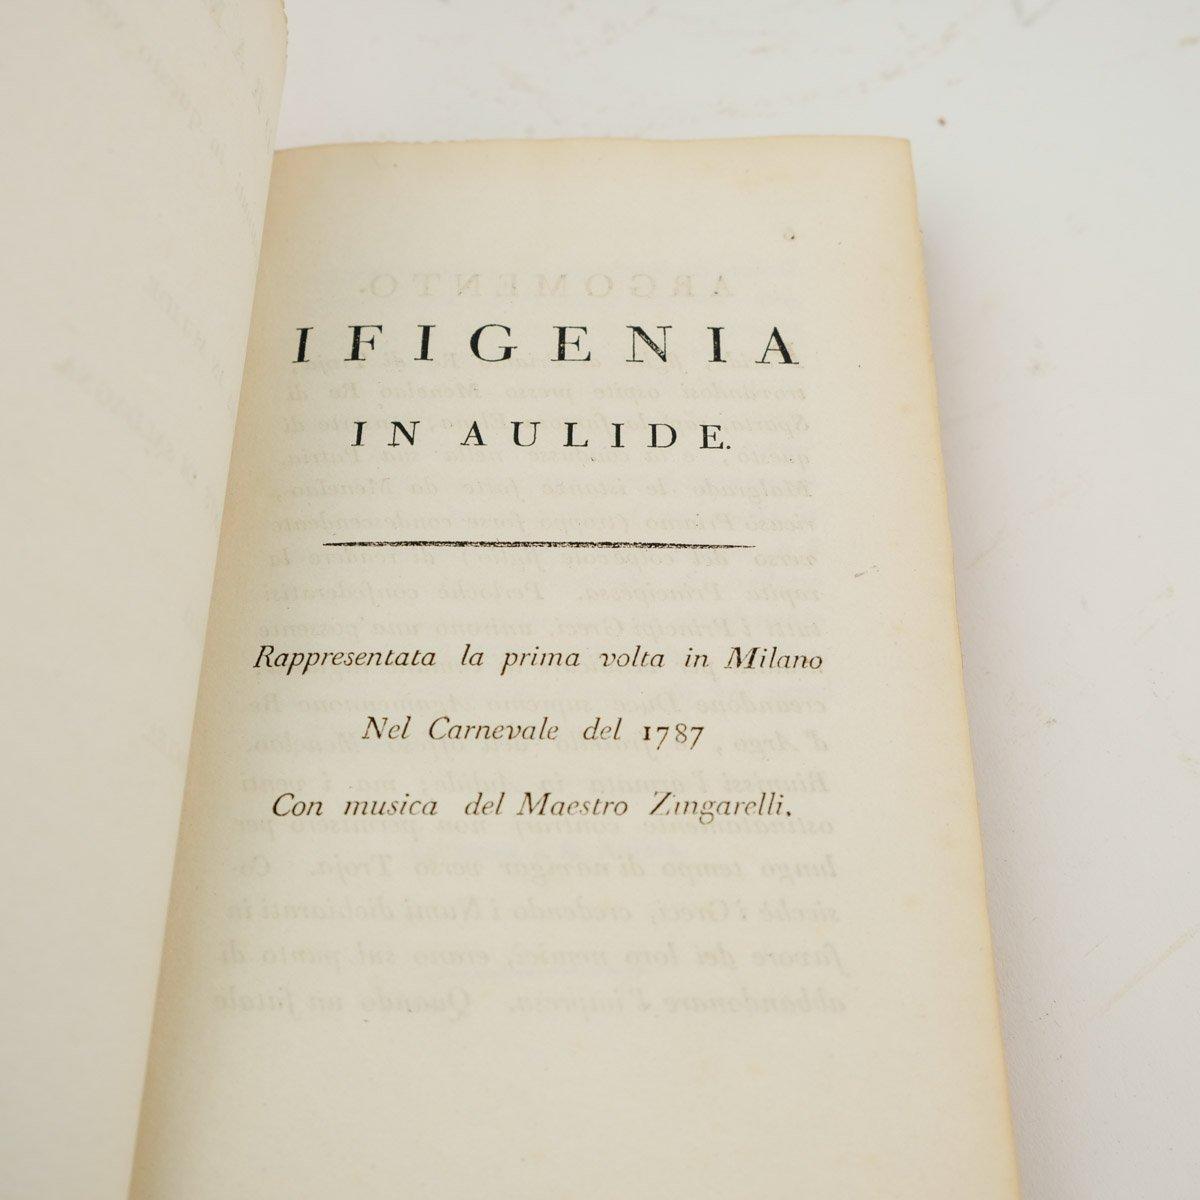 Operateksten van Ferdinando Moretti, vier delen, uitgave 1797